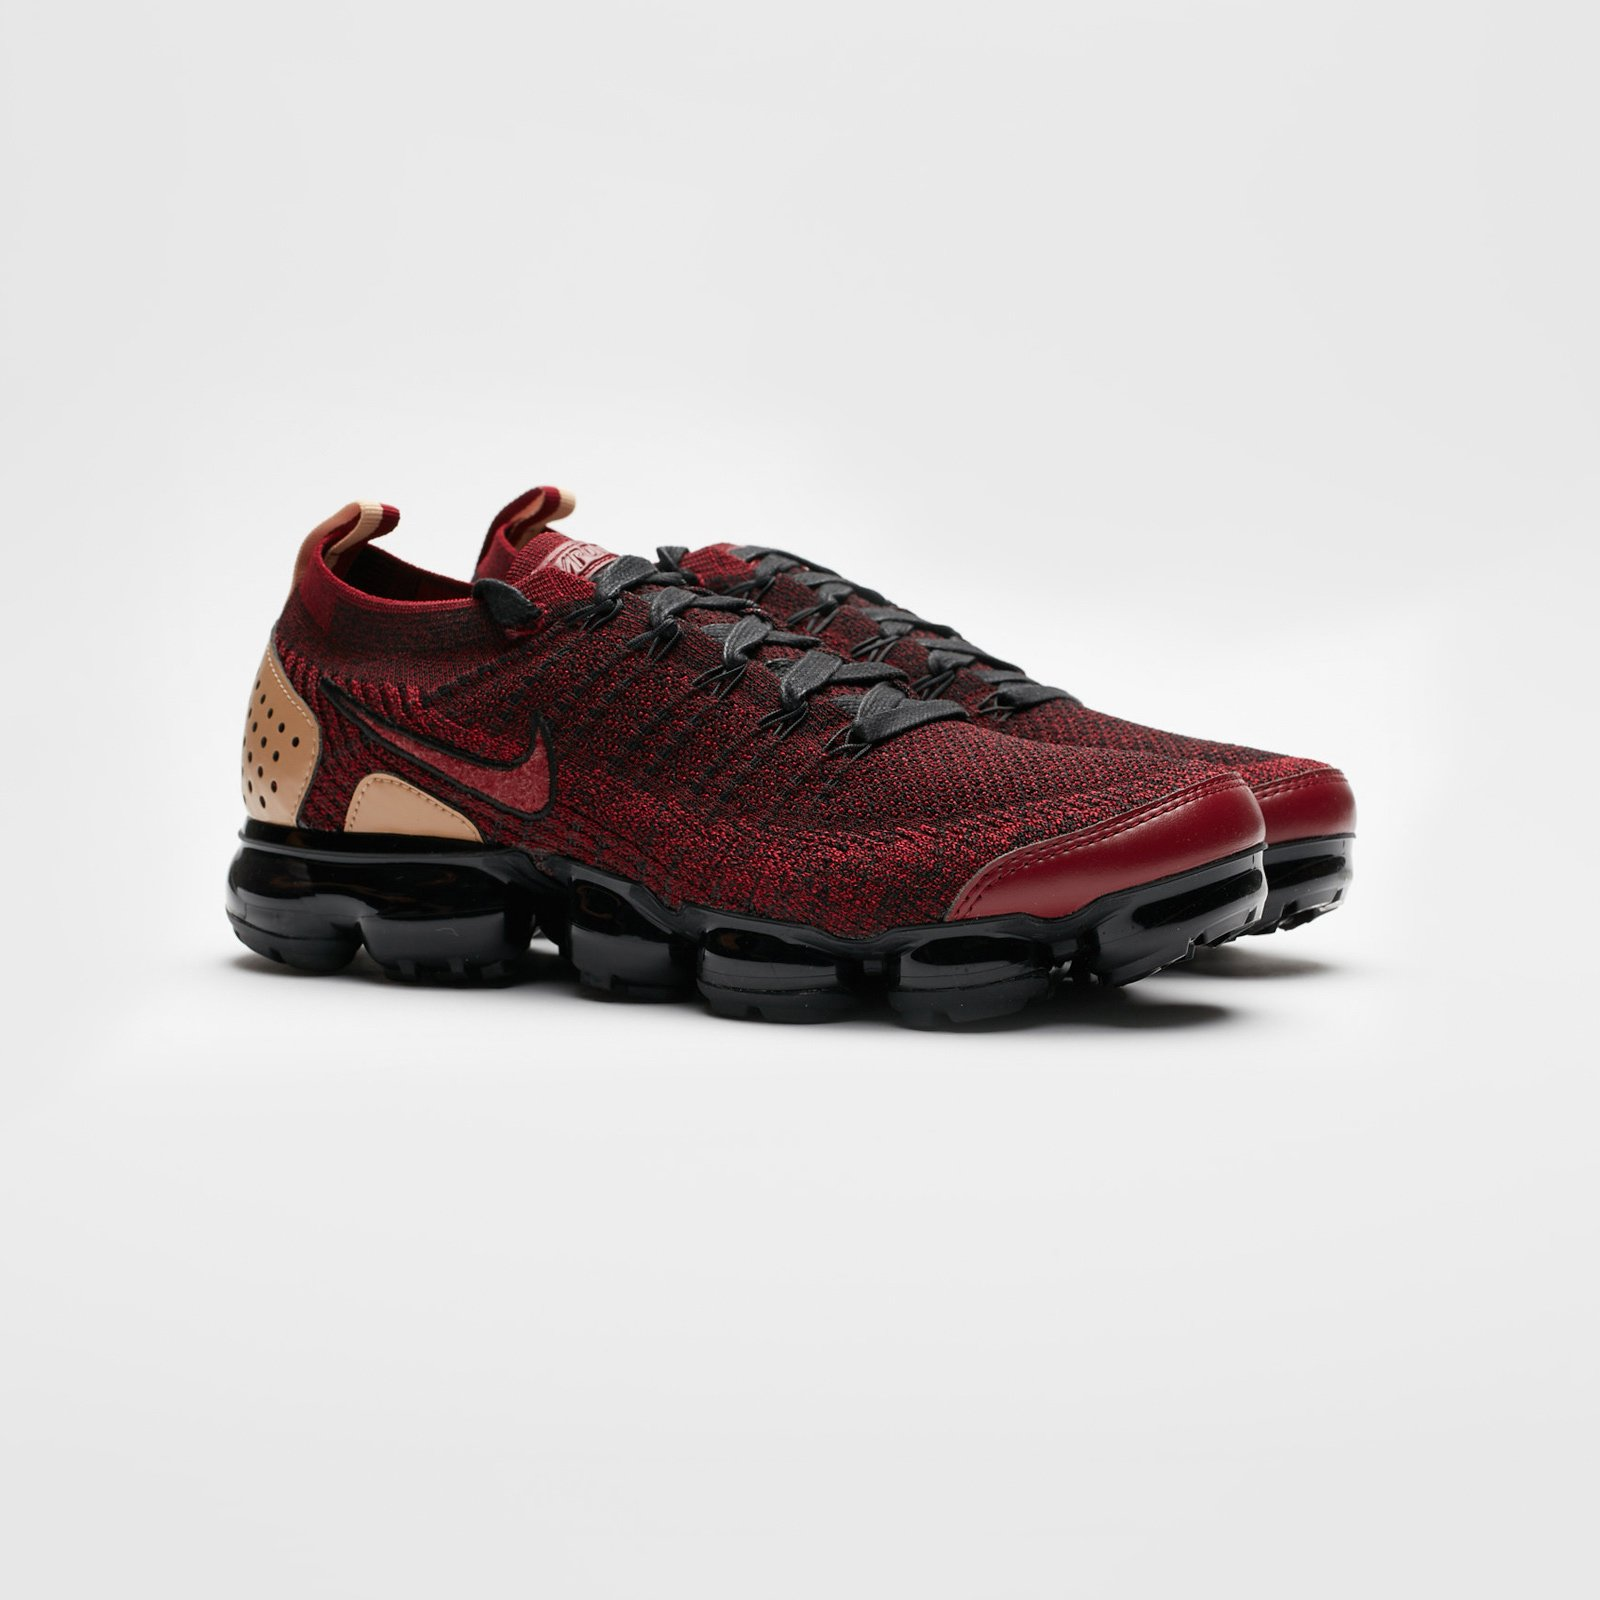 ca201948661 Nike Air Vapormax FK 2 NRG - At8955-600 - Sneakersnstuff